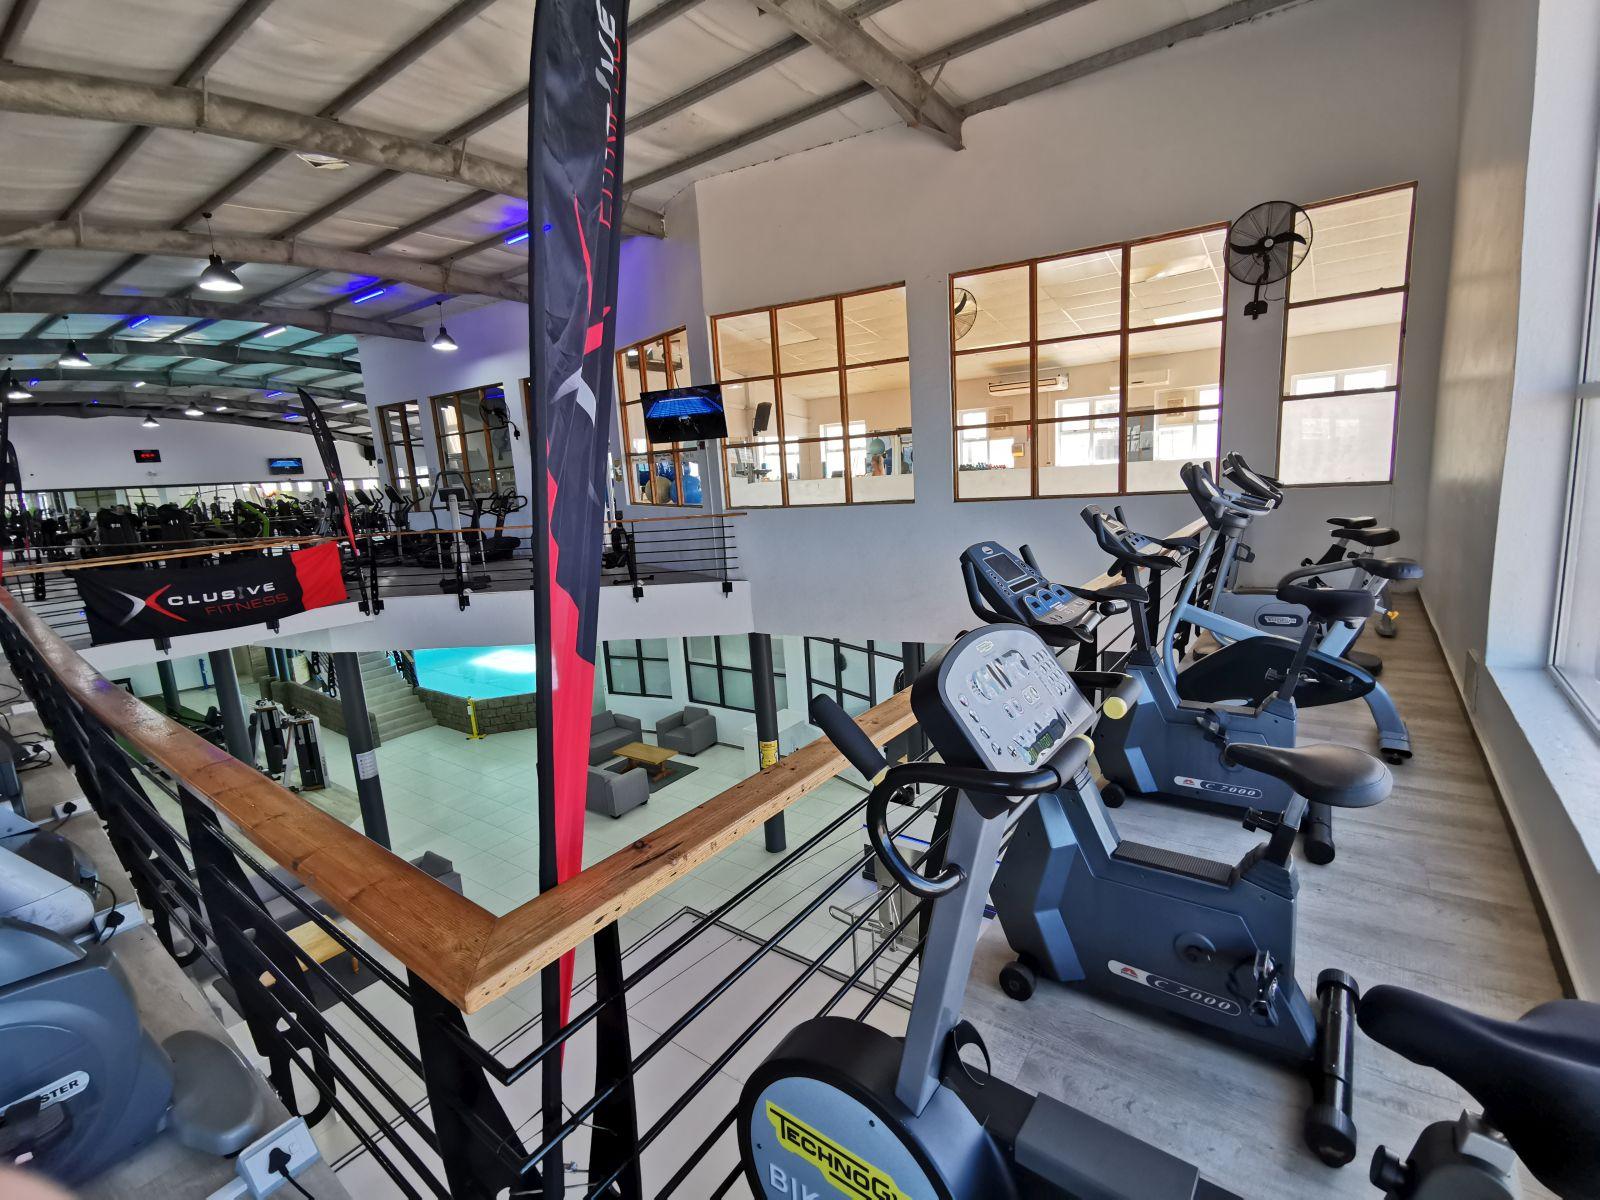 Xclusive Fitness Img 20200828 125023